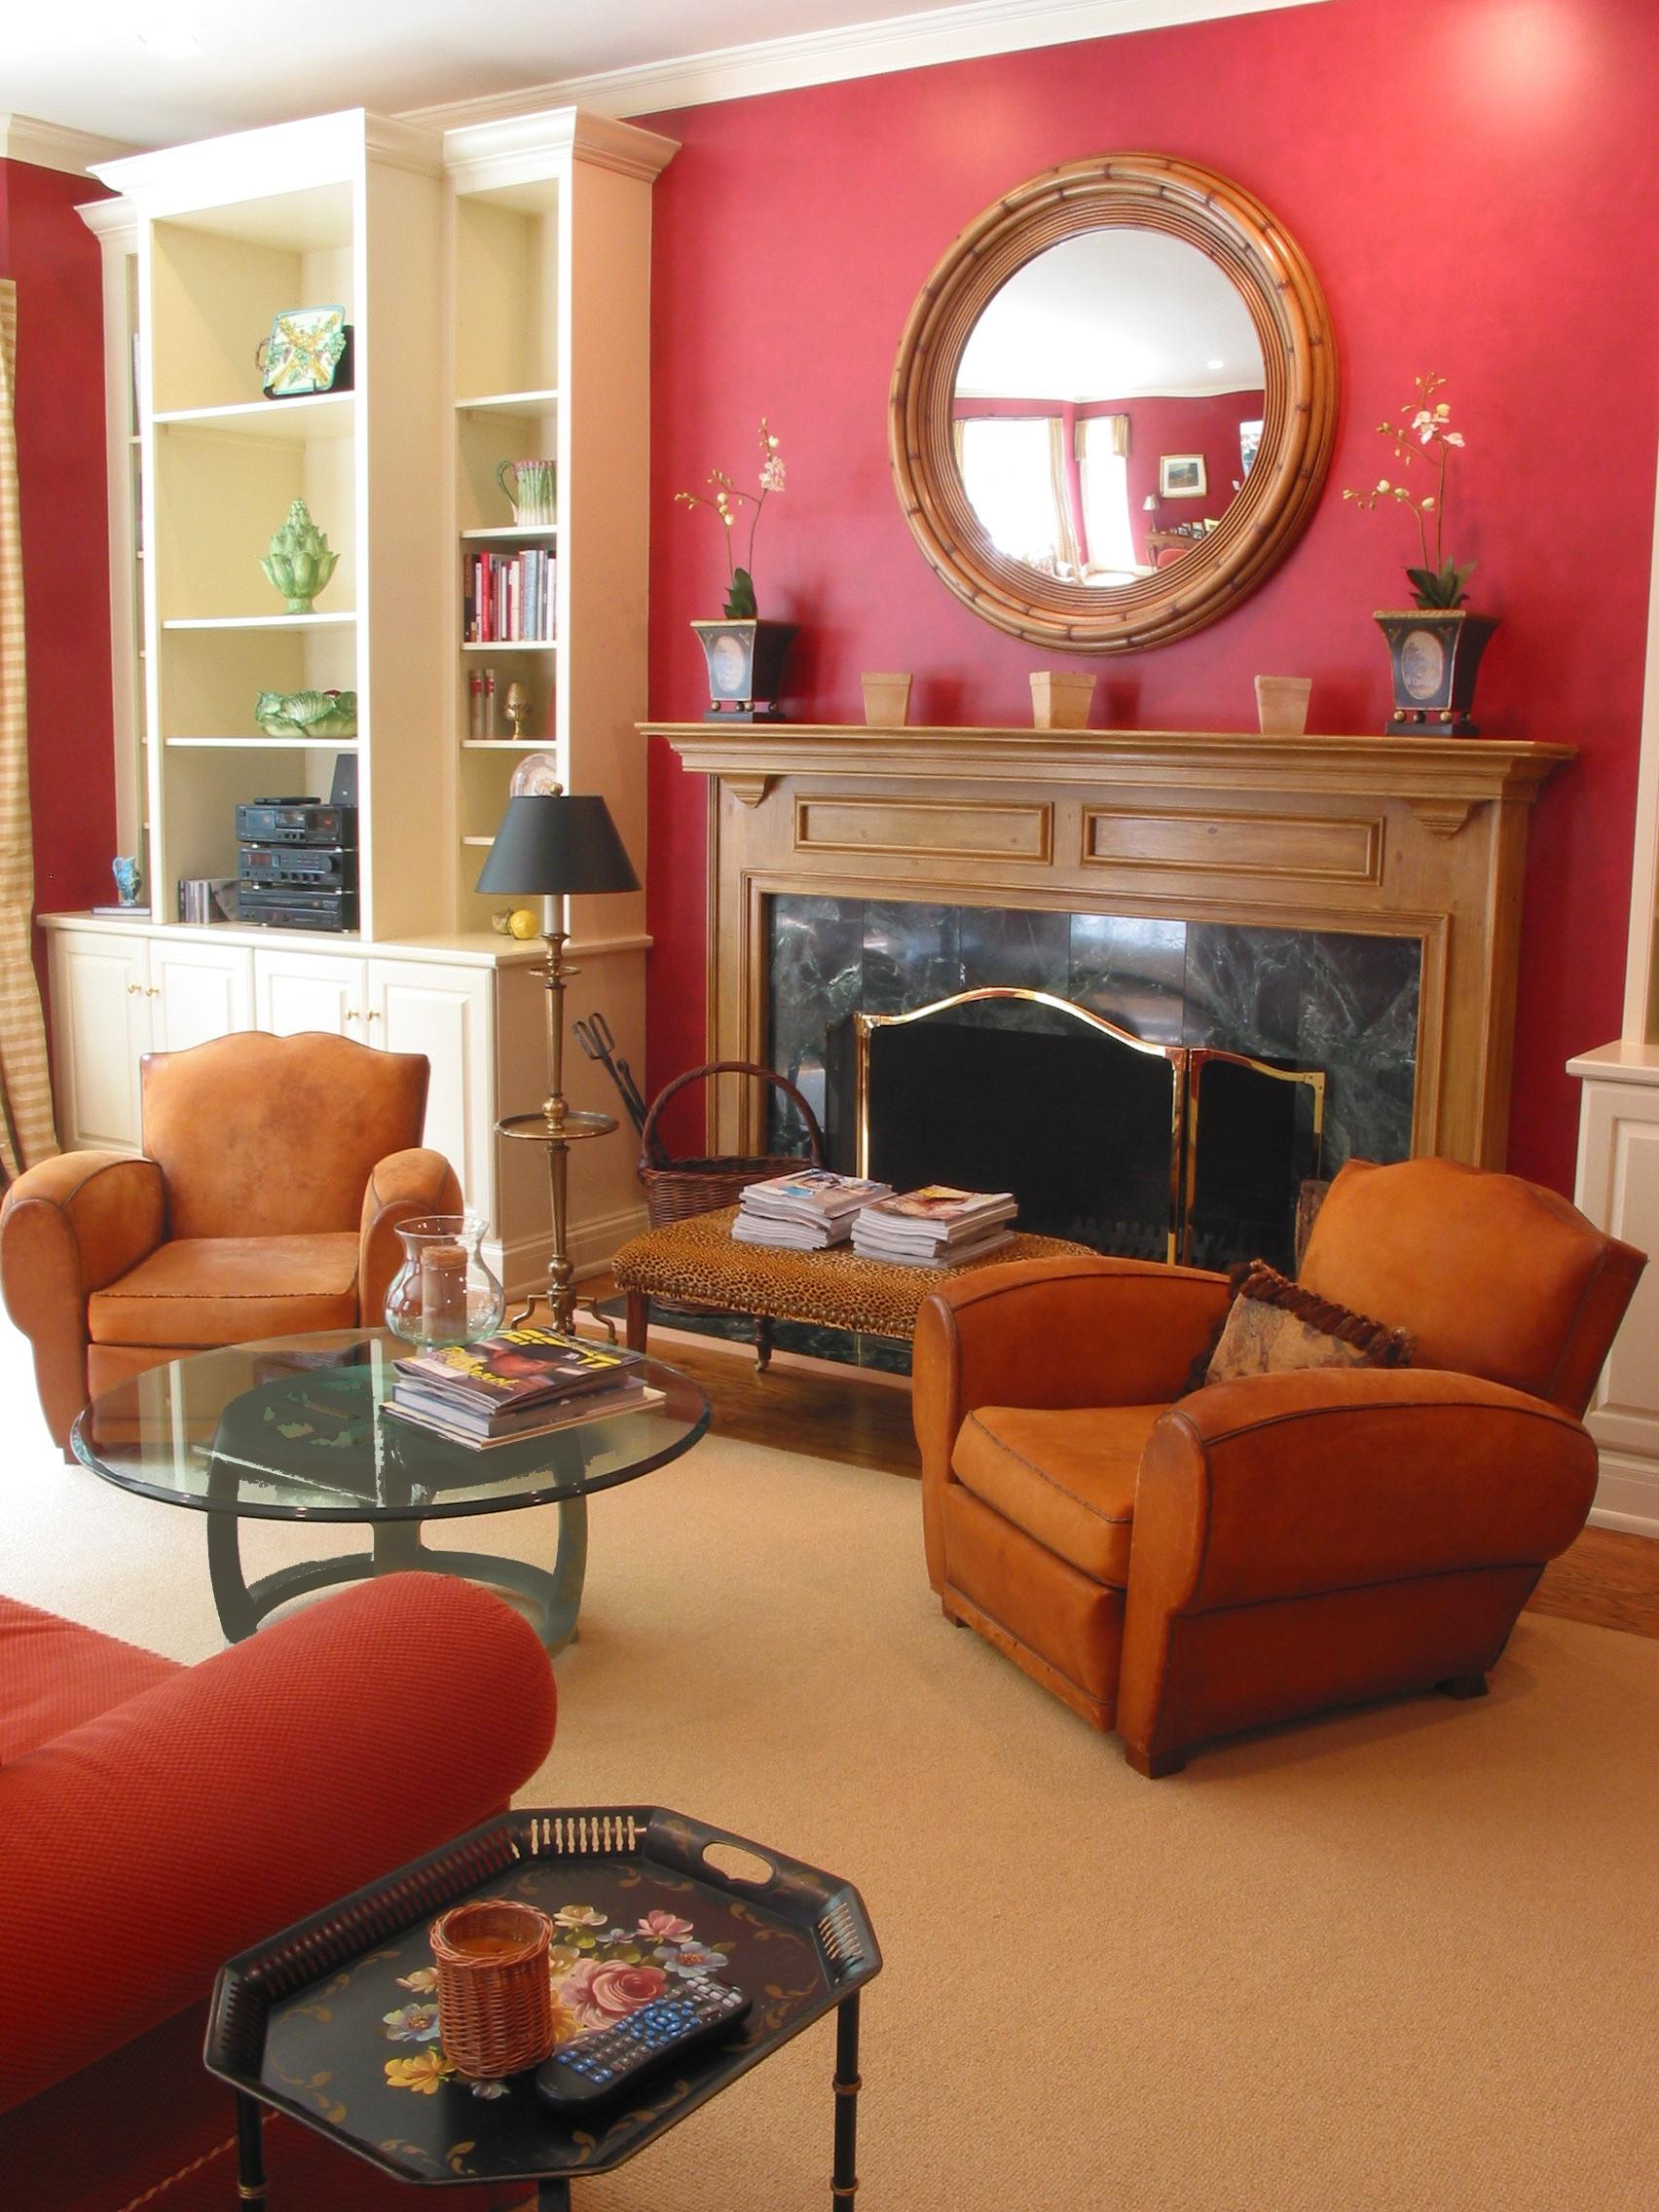 Faux bois mantel and glazed walls